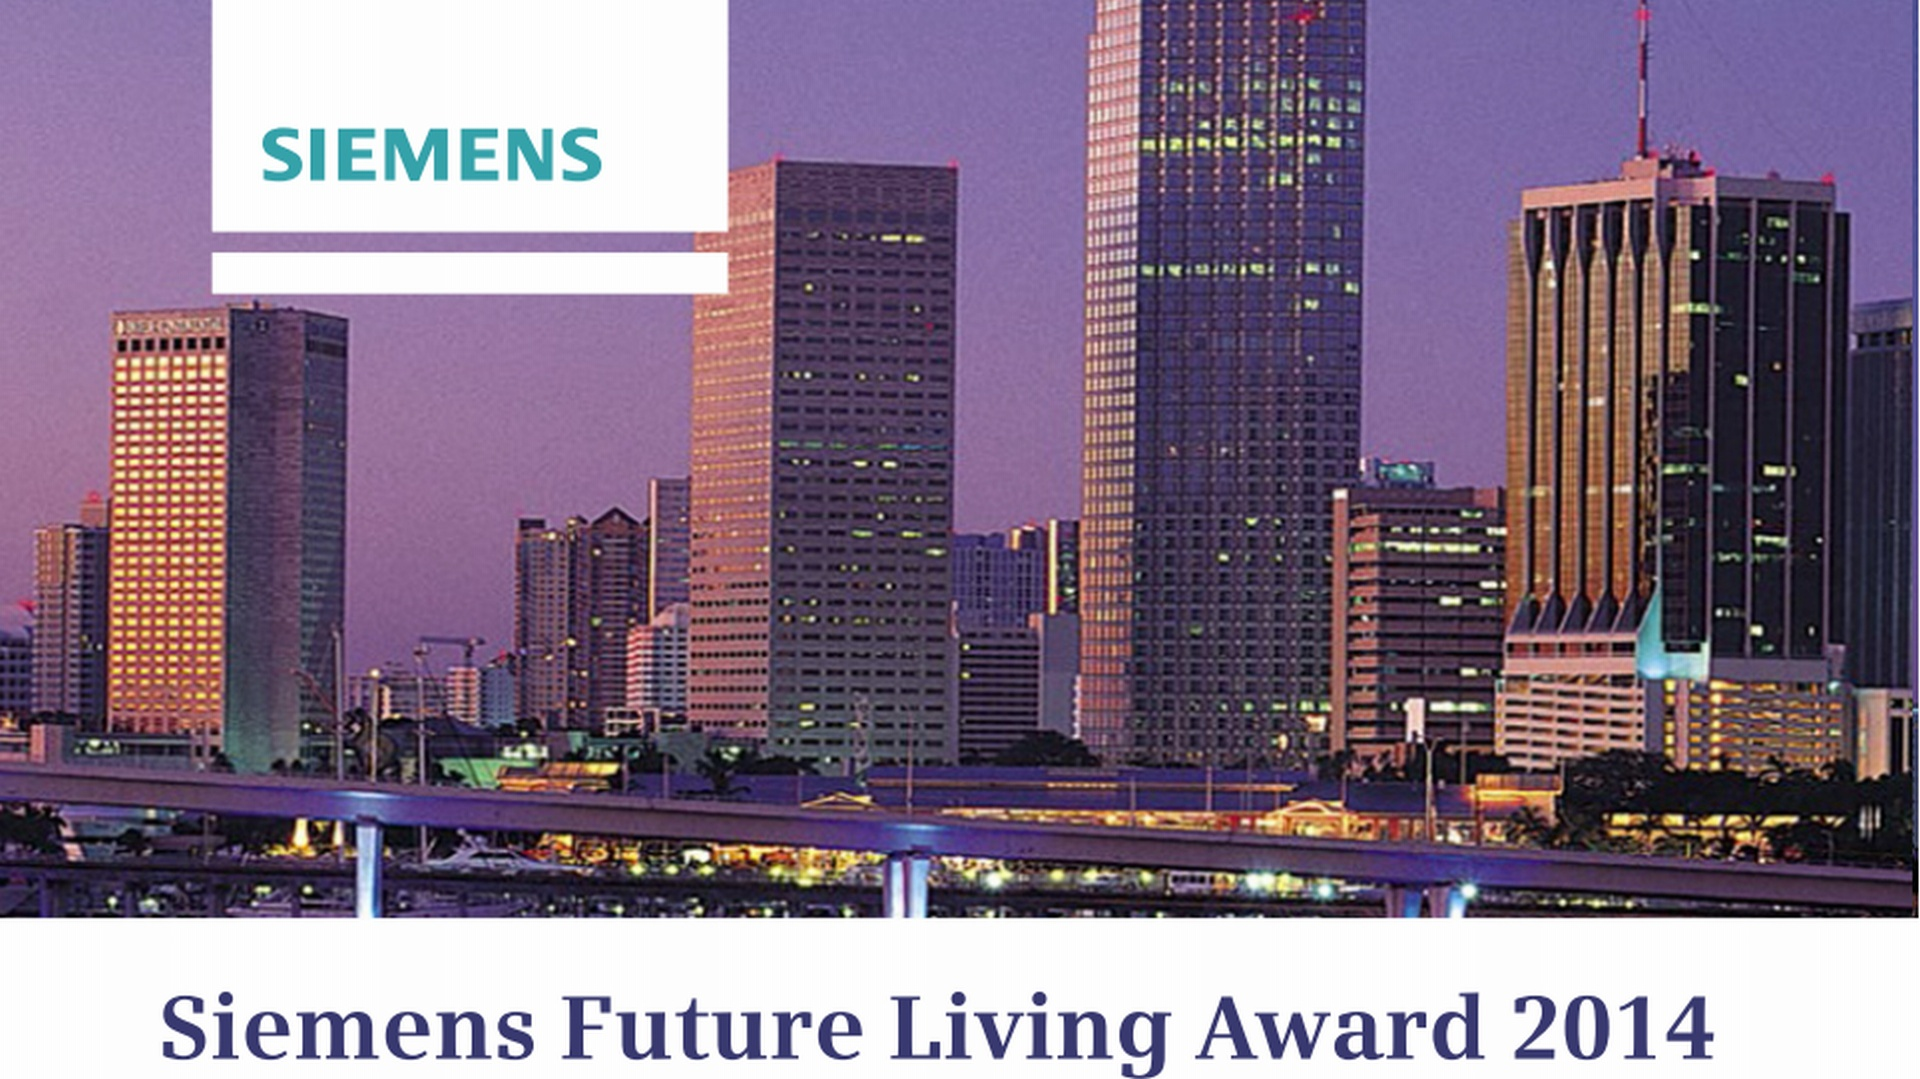 Siemens Future Livin Award 2014.jpg